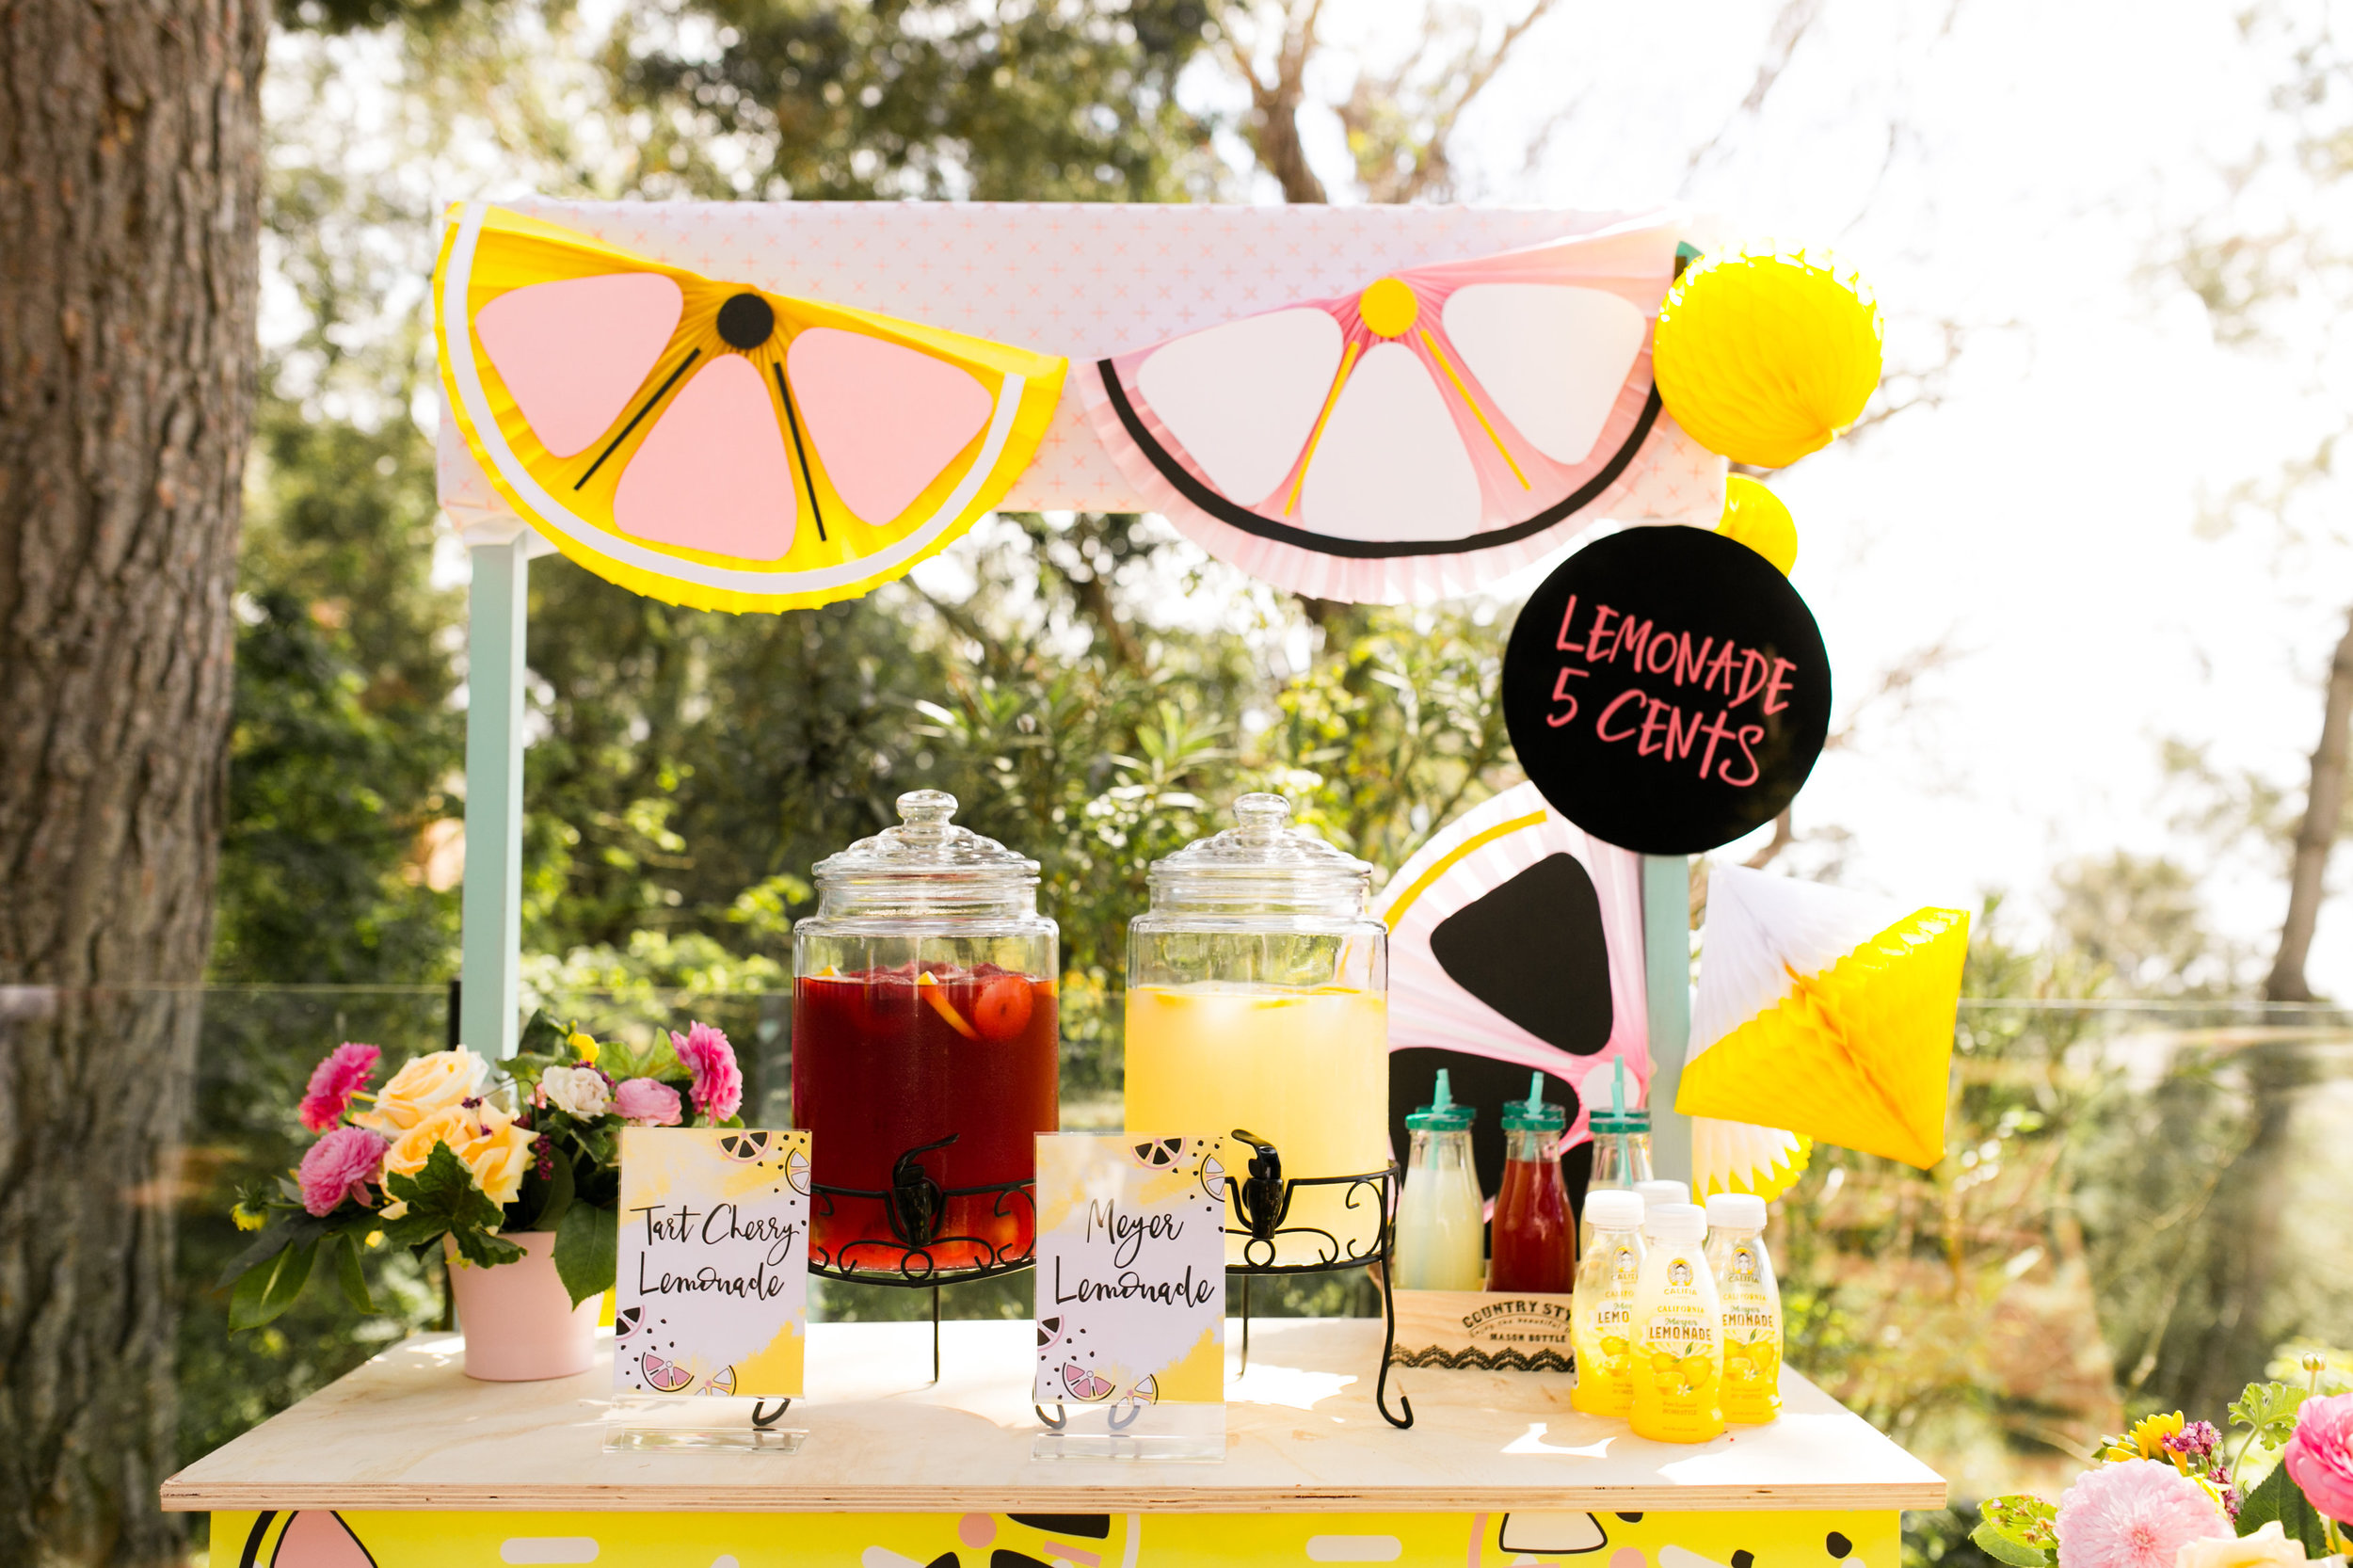 Lemonade Stand Kids Birthday Party - Custom Lemon DIY Bunting fans